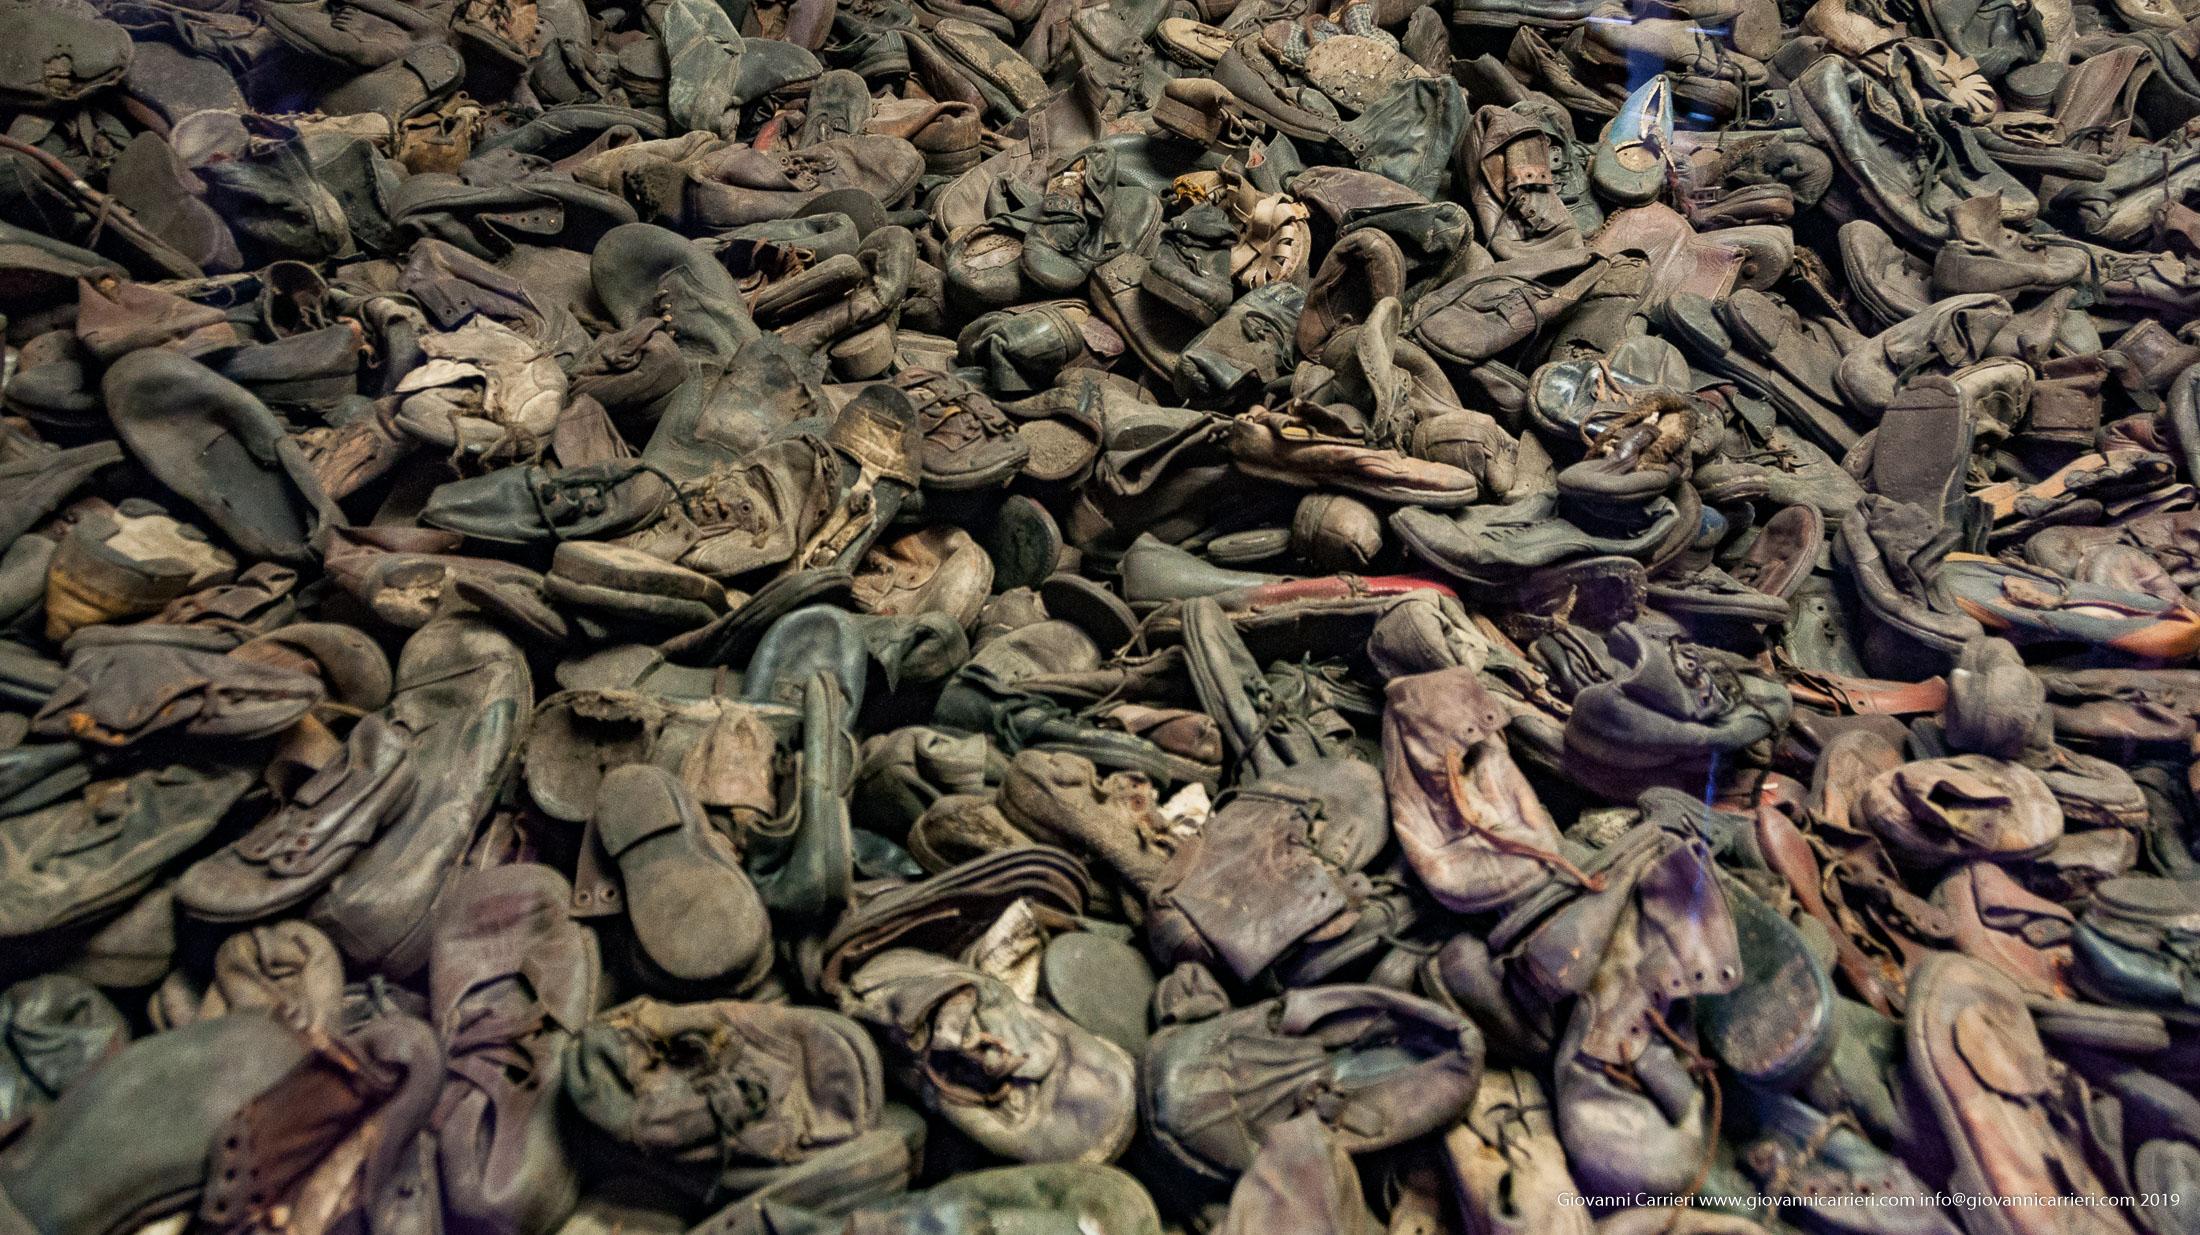 Scarpe rubate - Auschwitz